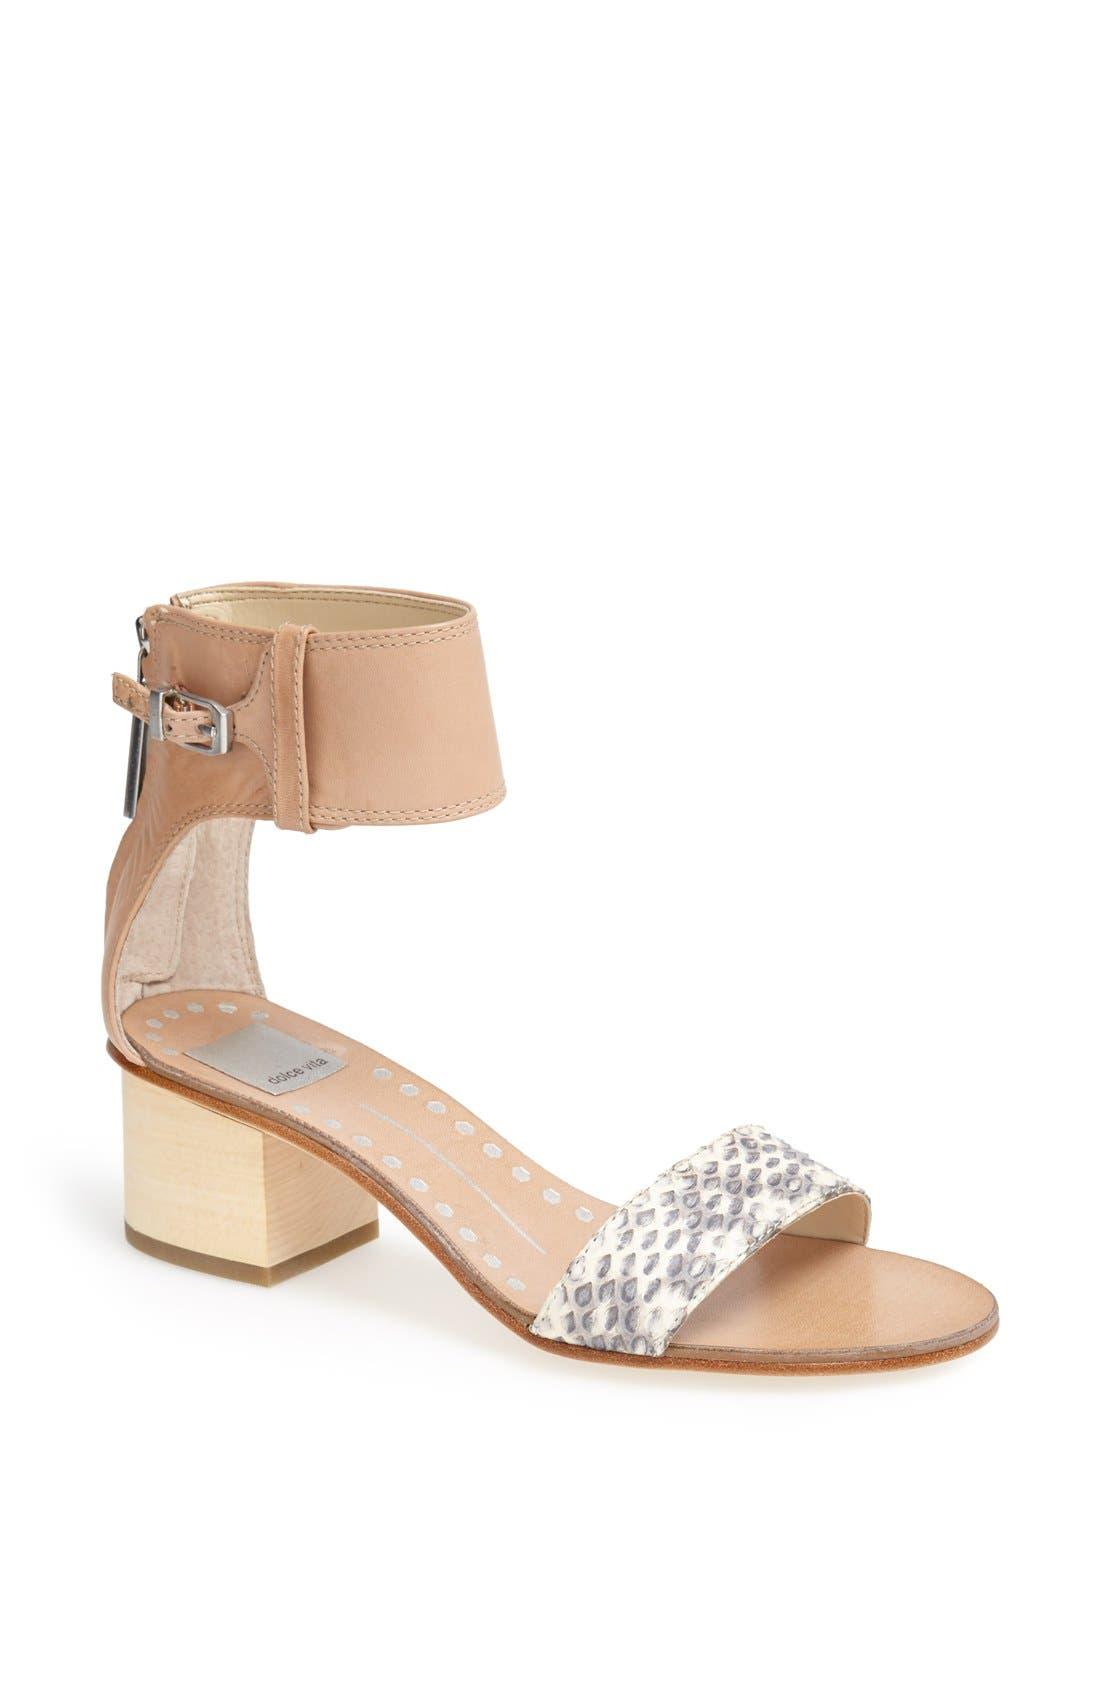 Main Image - Dolce Vita 'Foxie' Sandal